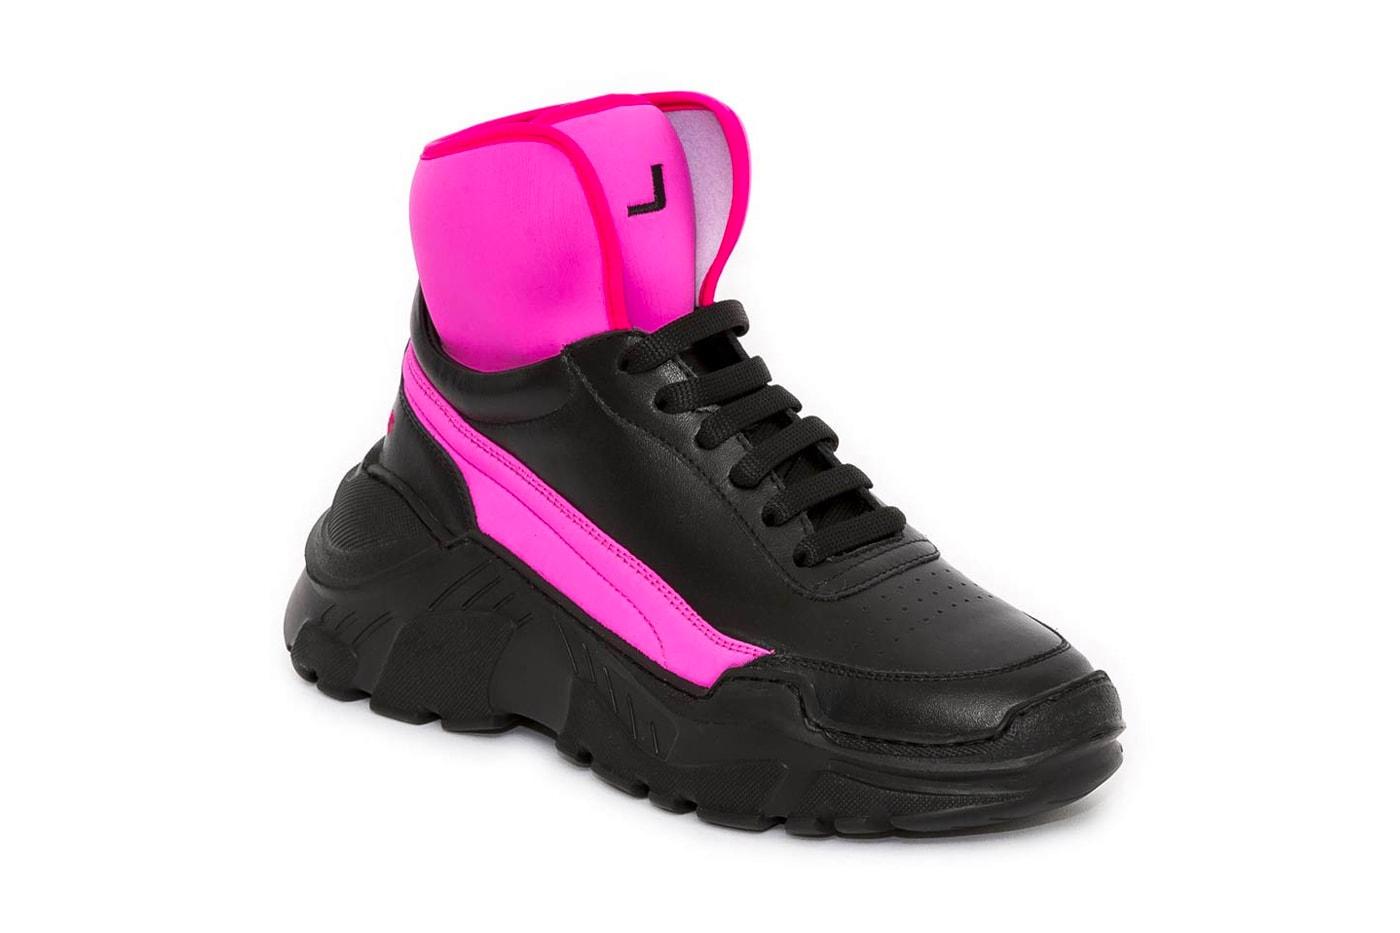 Joshua Sanders ZENITH NEOPRENE Sneaker Lookbook collection footwear price purchase